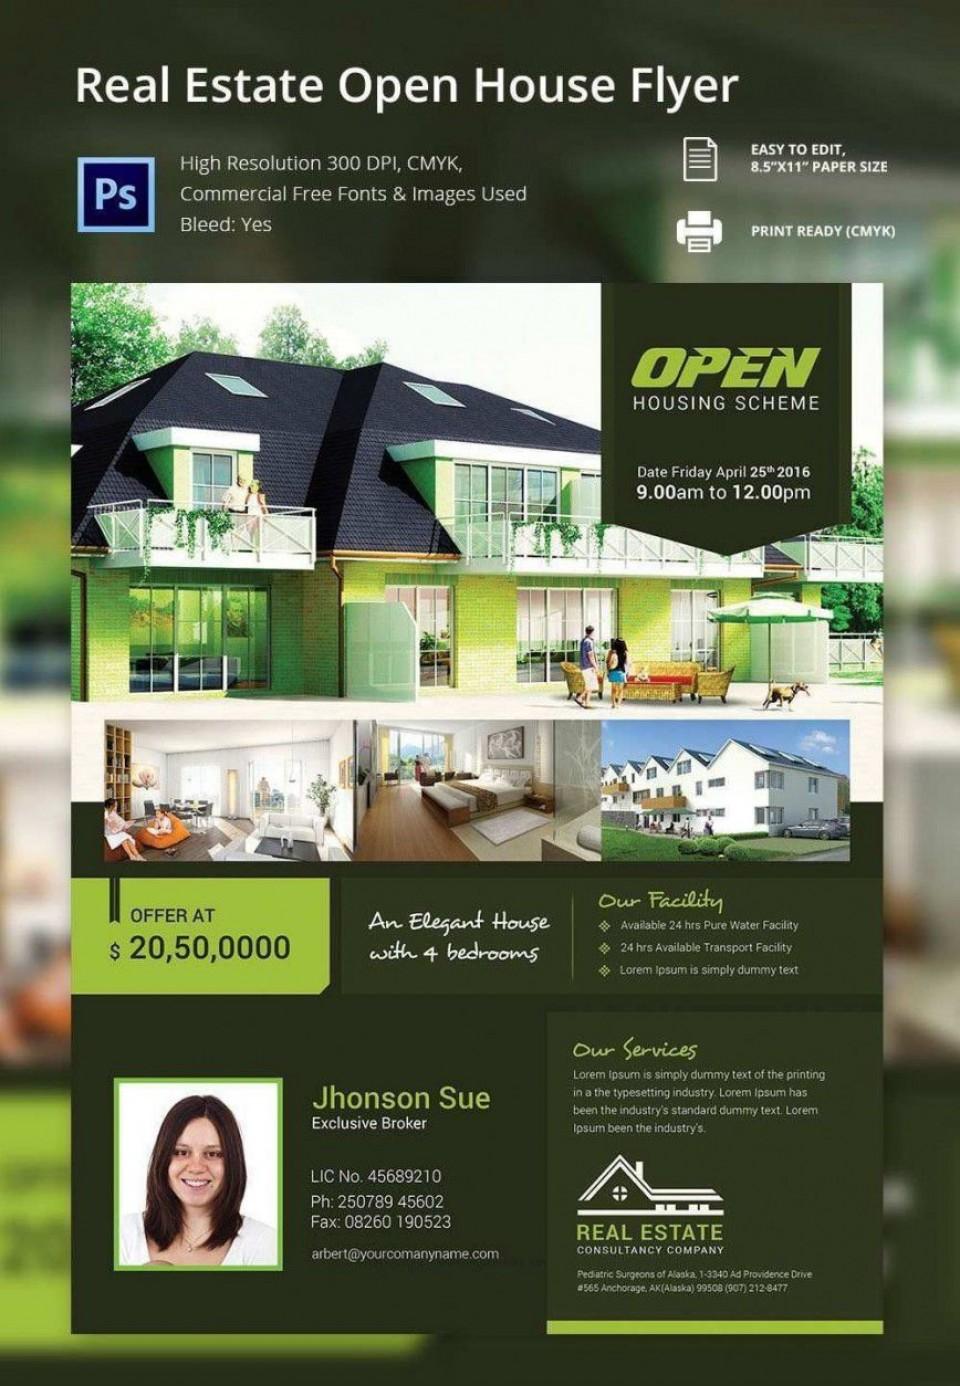 000 Beautiful Open House Flyer Template High Def  Word Free School Microsoft960